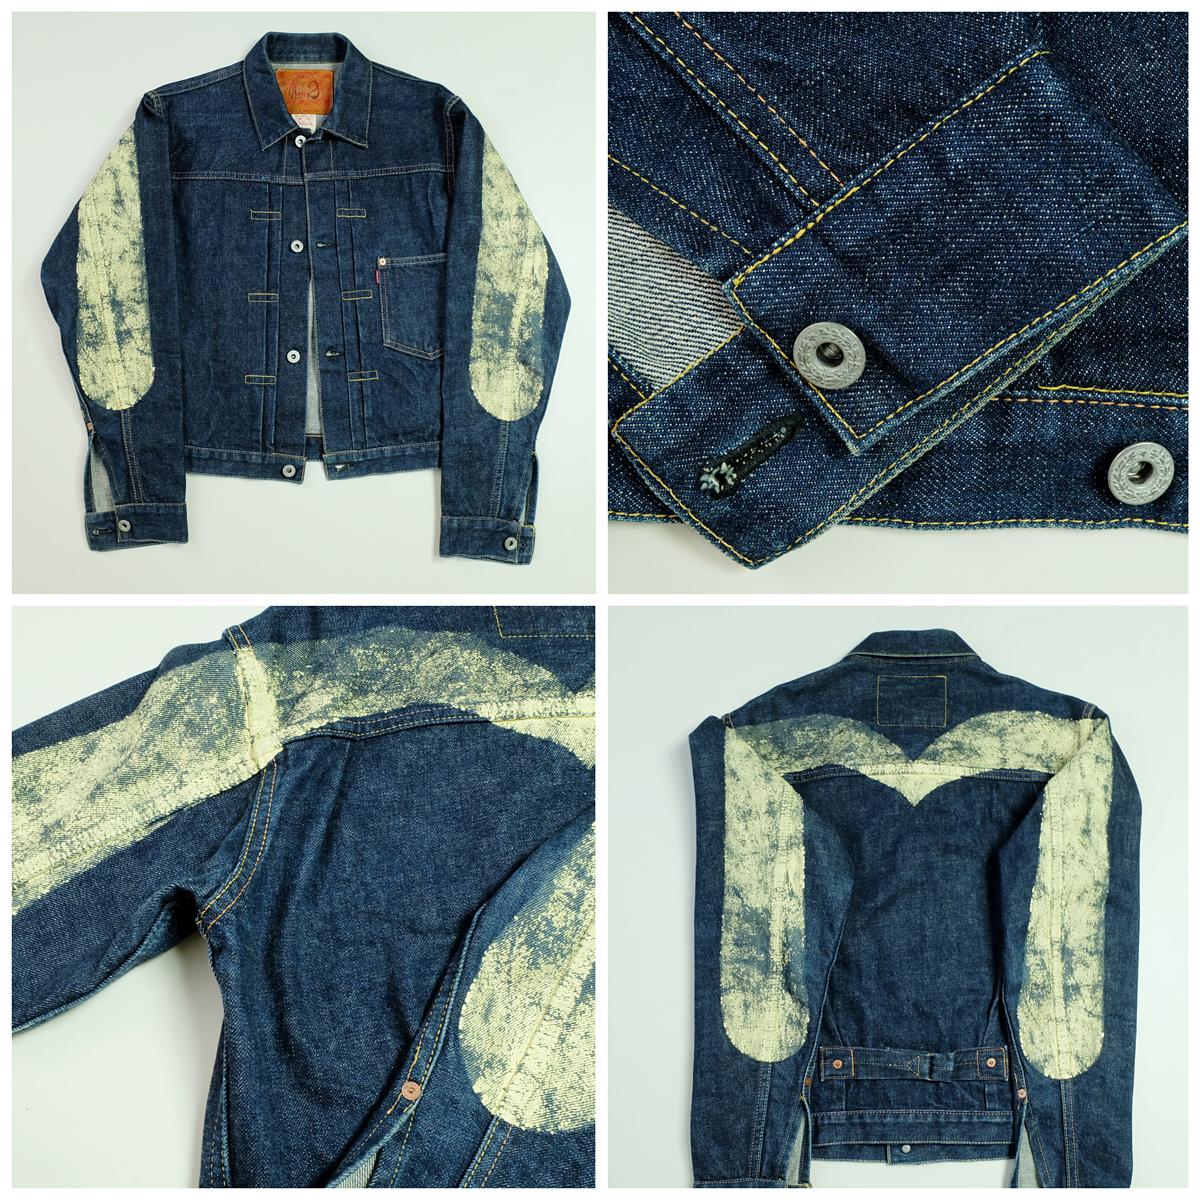 Vintagejapan Japanese Evisu Yamane Denim Genes Jeans Jacket Jackets Denim Jean Jacket [ 1200 x 1200 Pixel ]